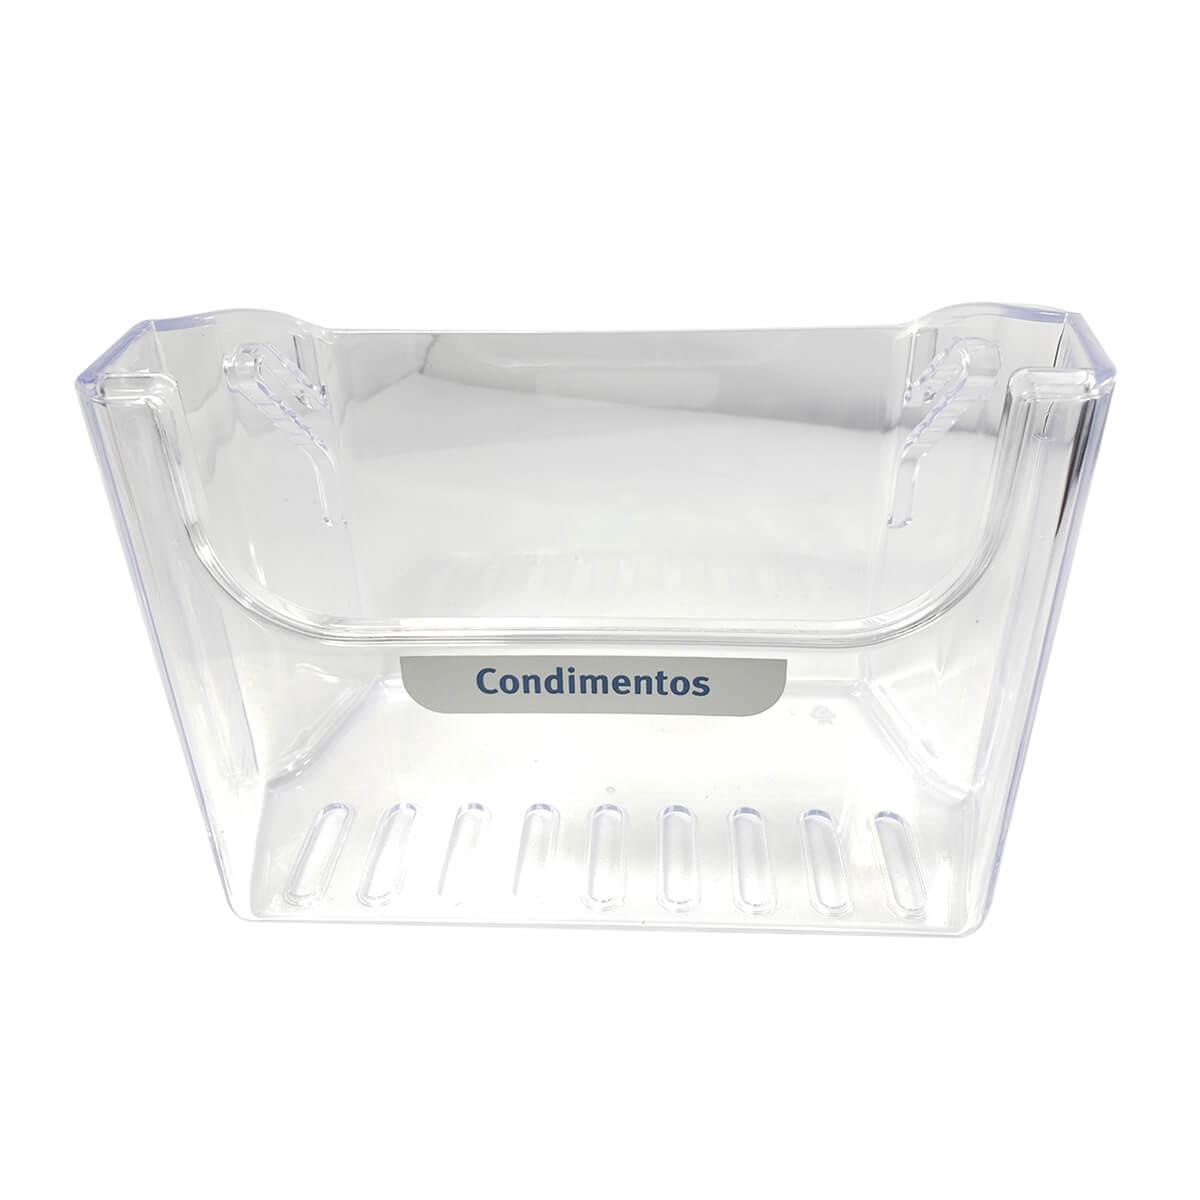 Prateleira De Condimentos Para Geladeira Dcw49 Dc50x Electrolux - 67492958